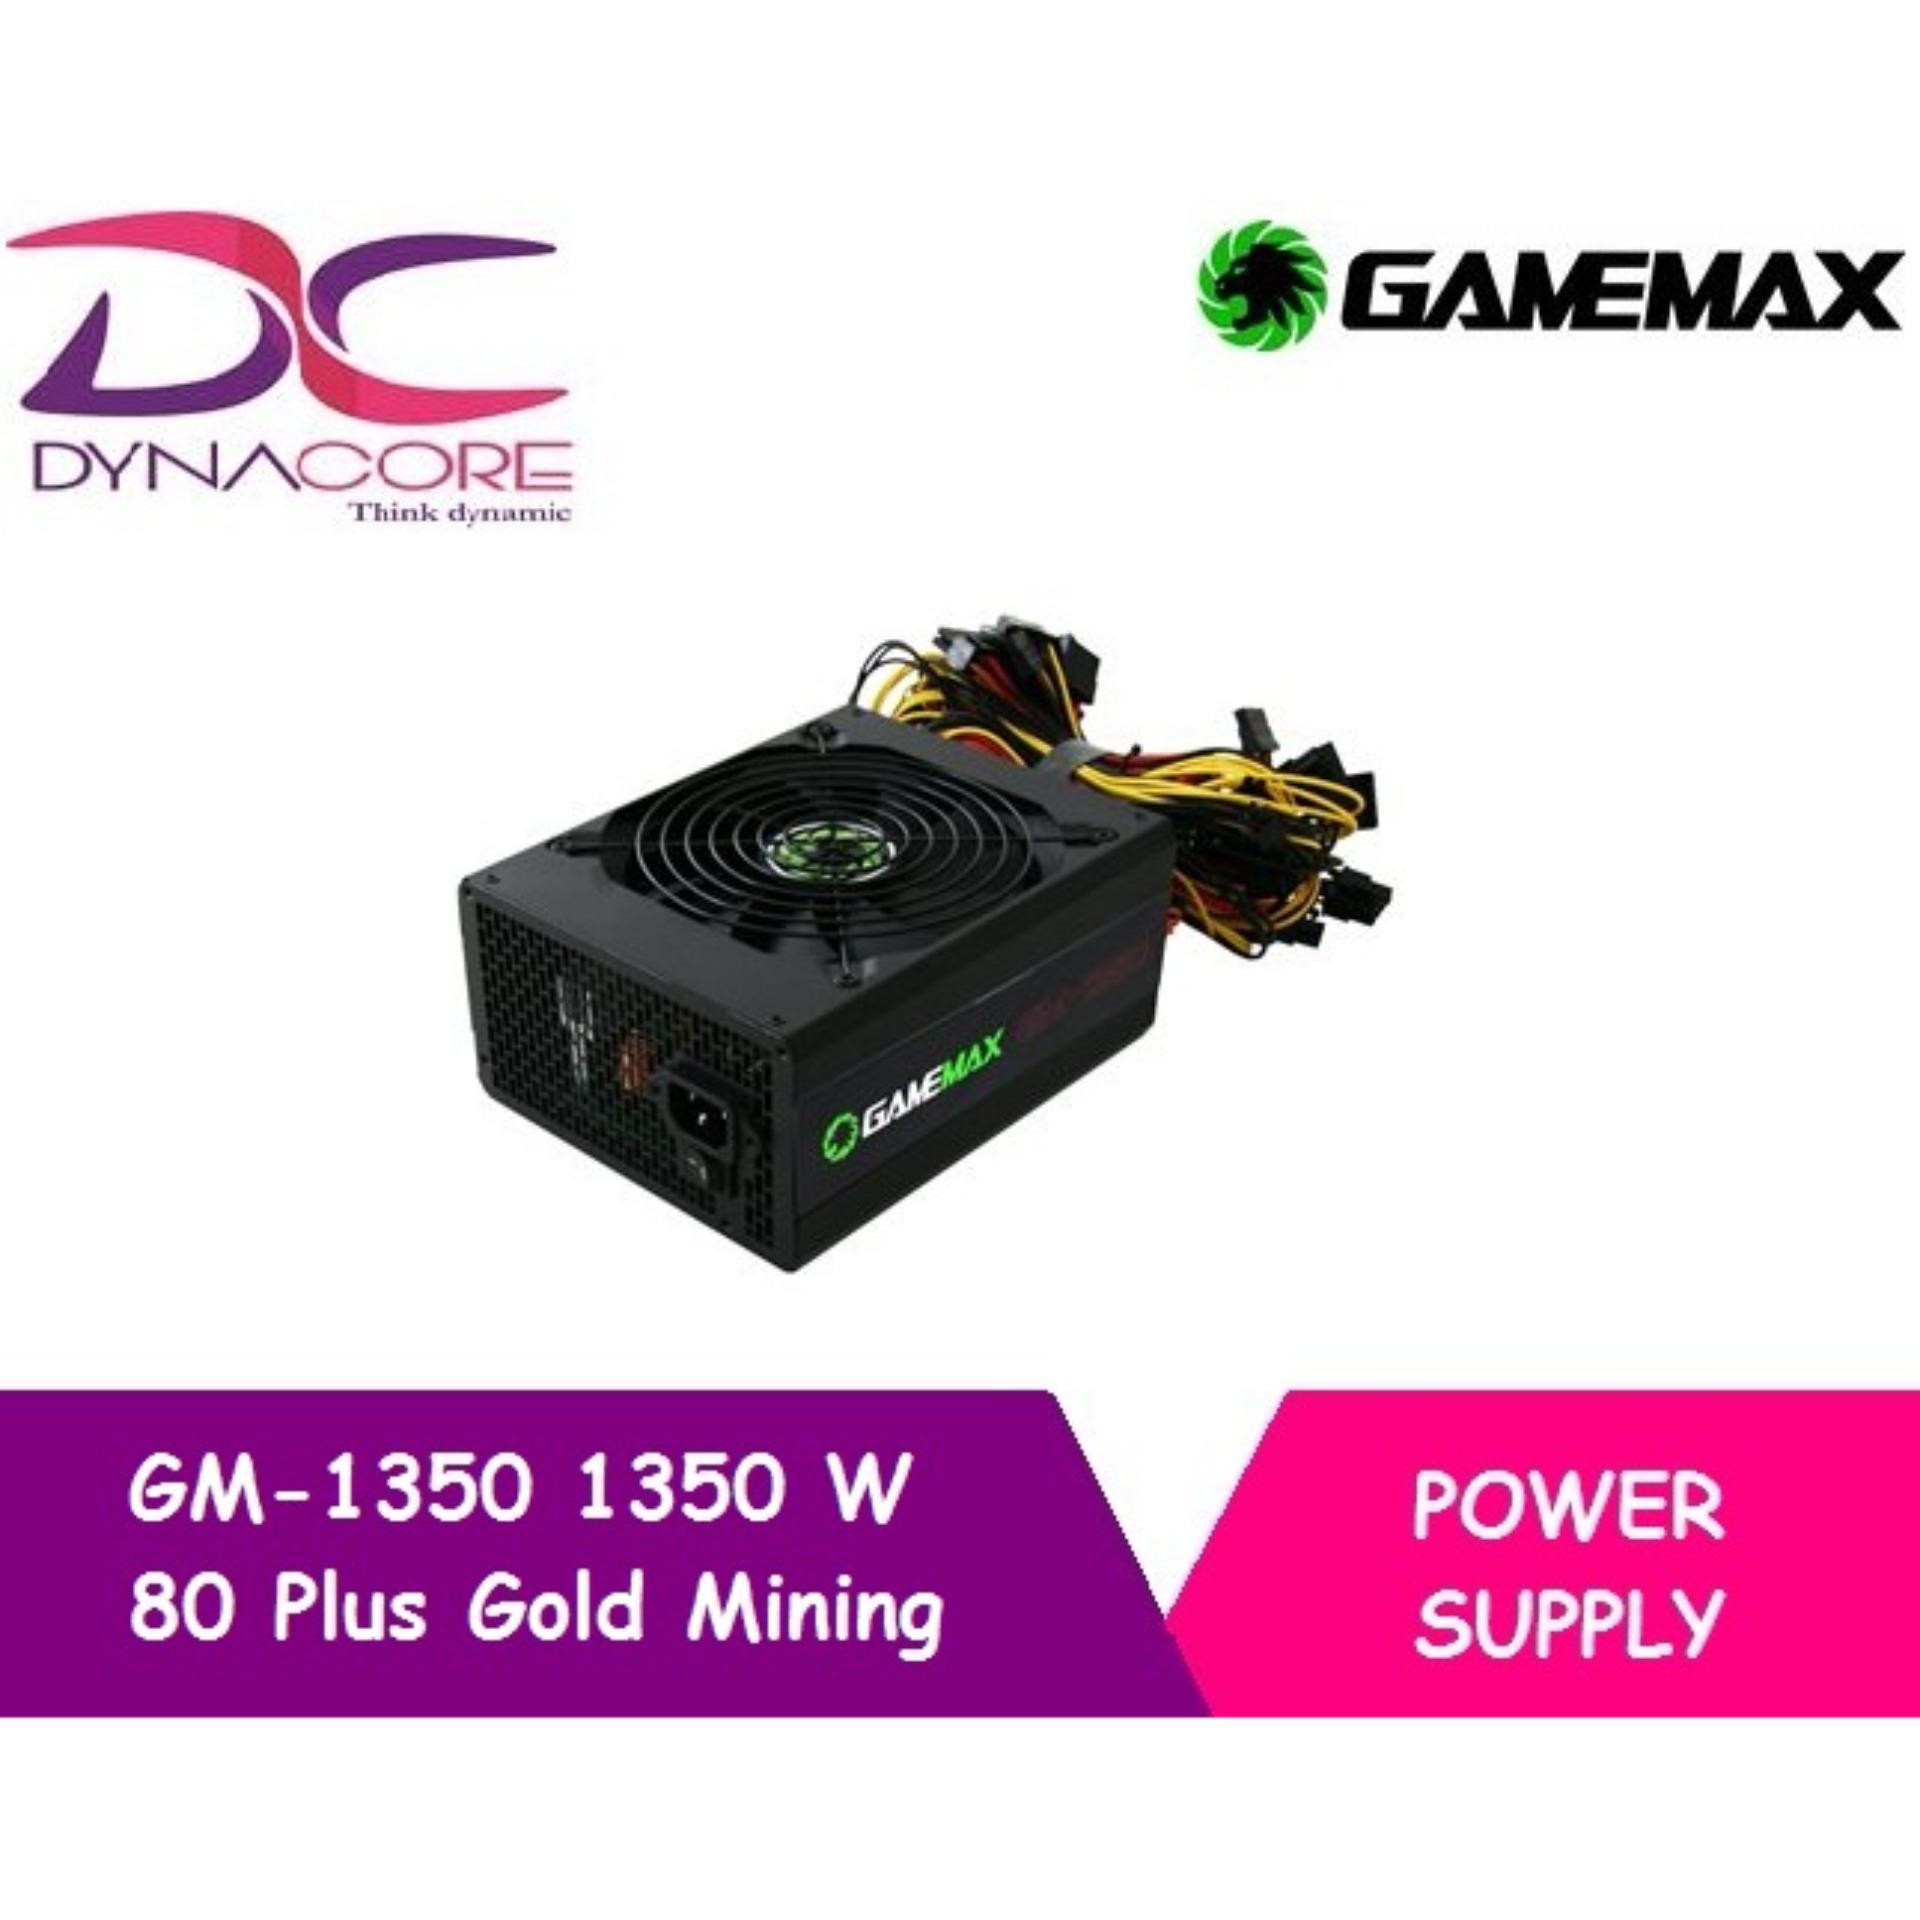 gm supply power - Isken kaptanband co